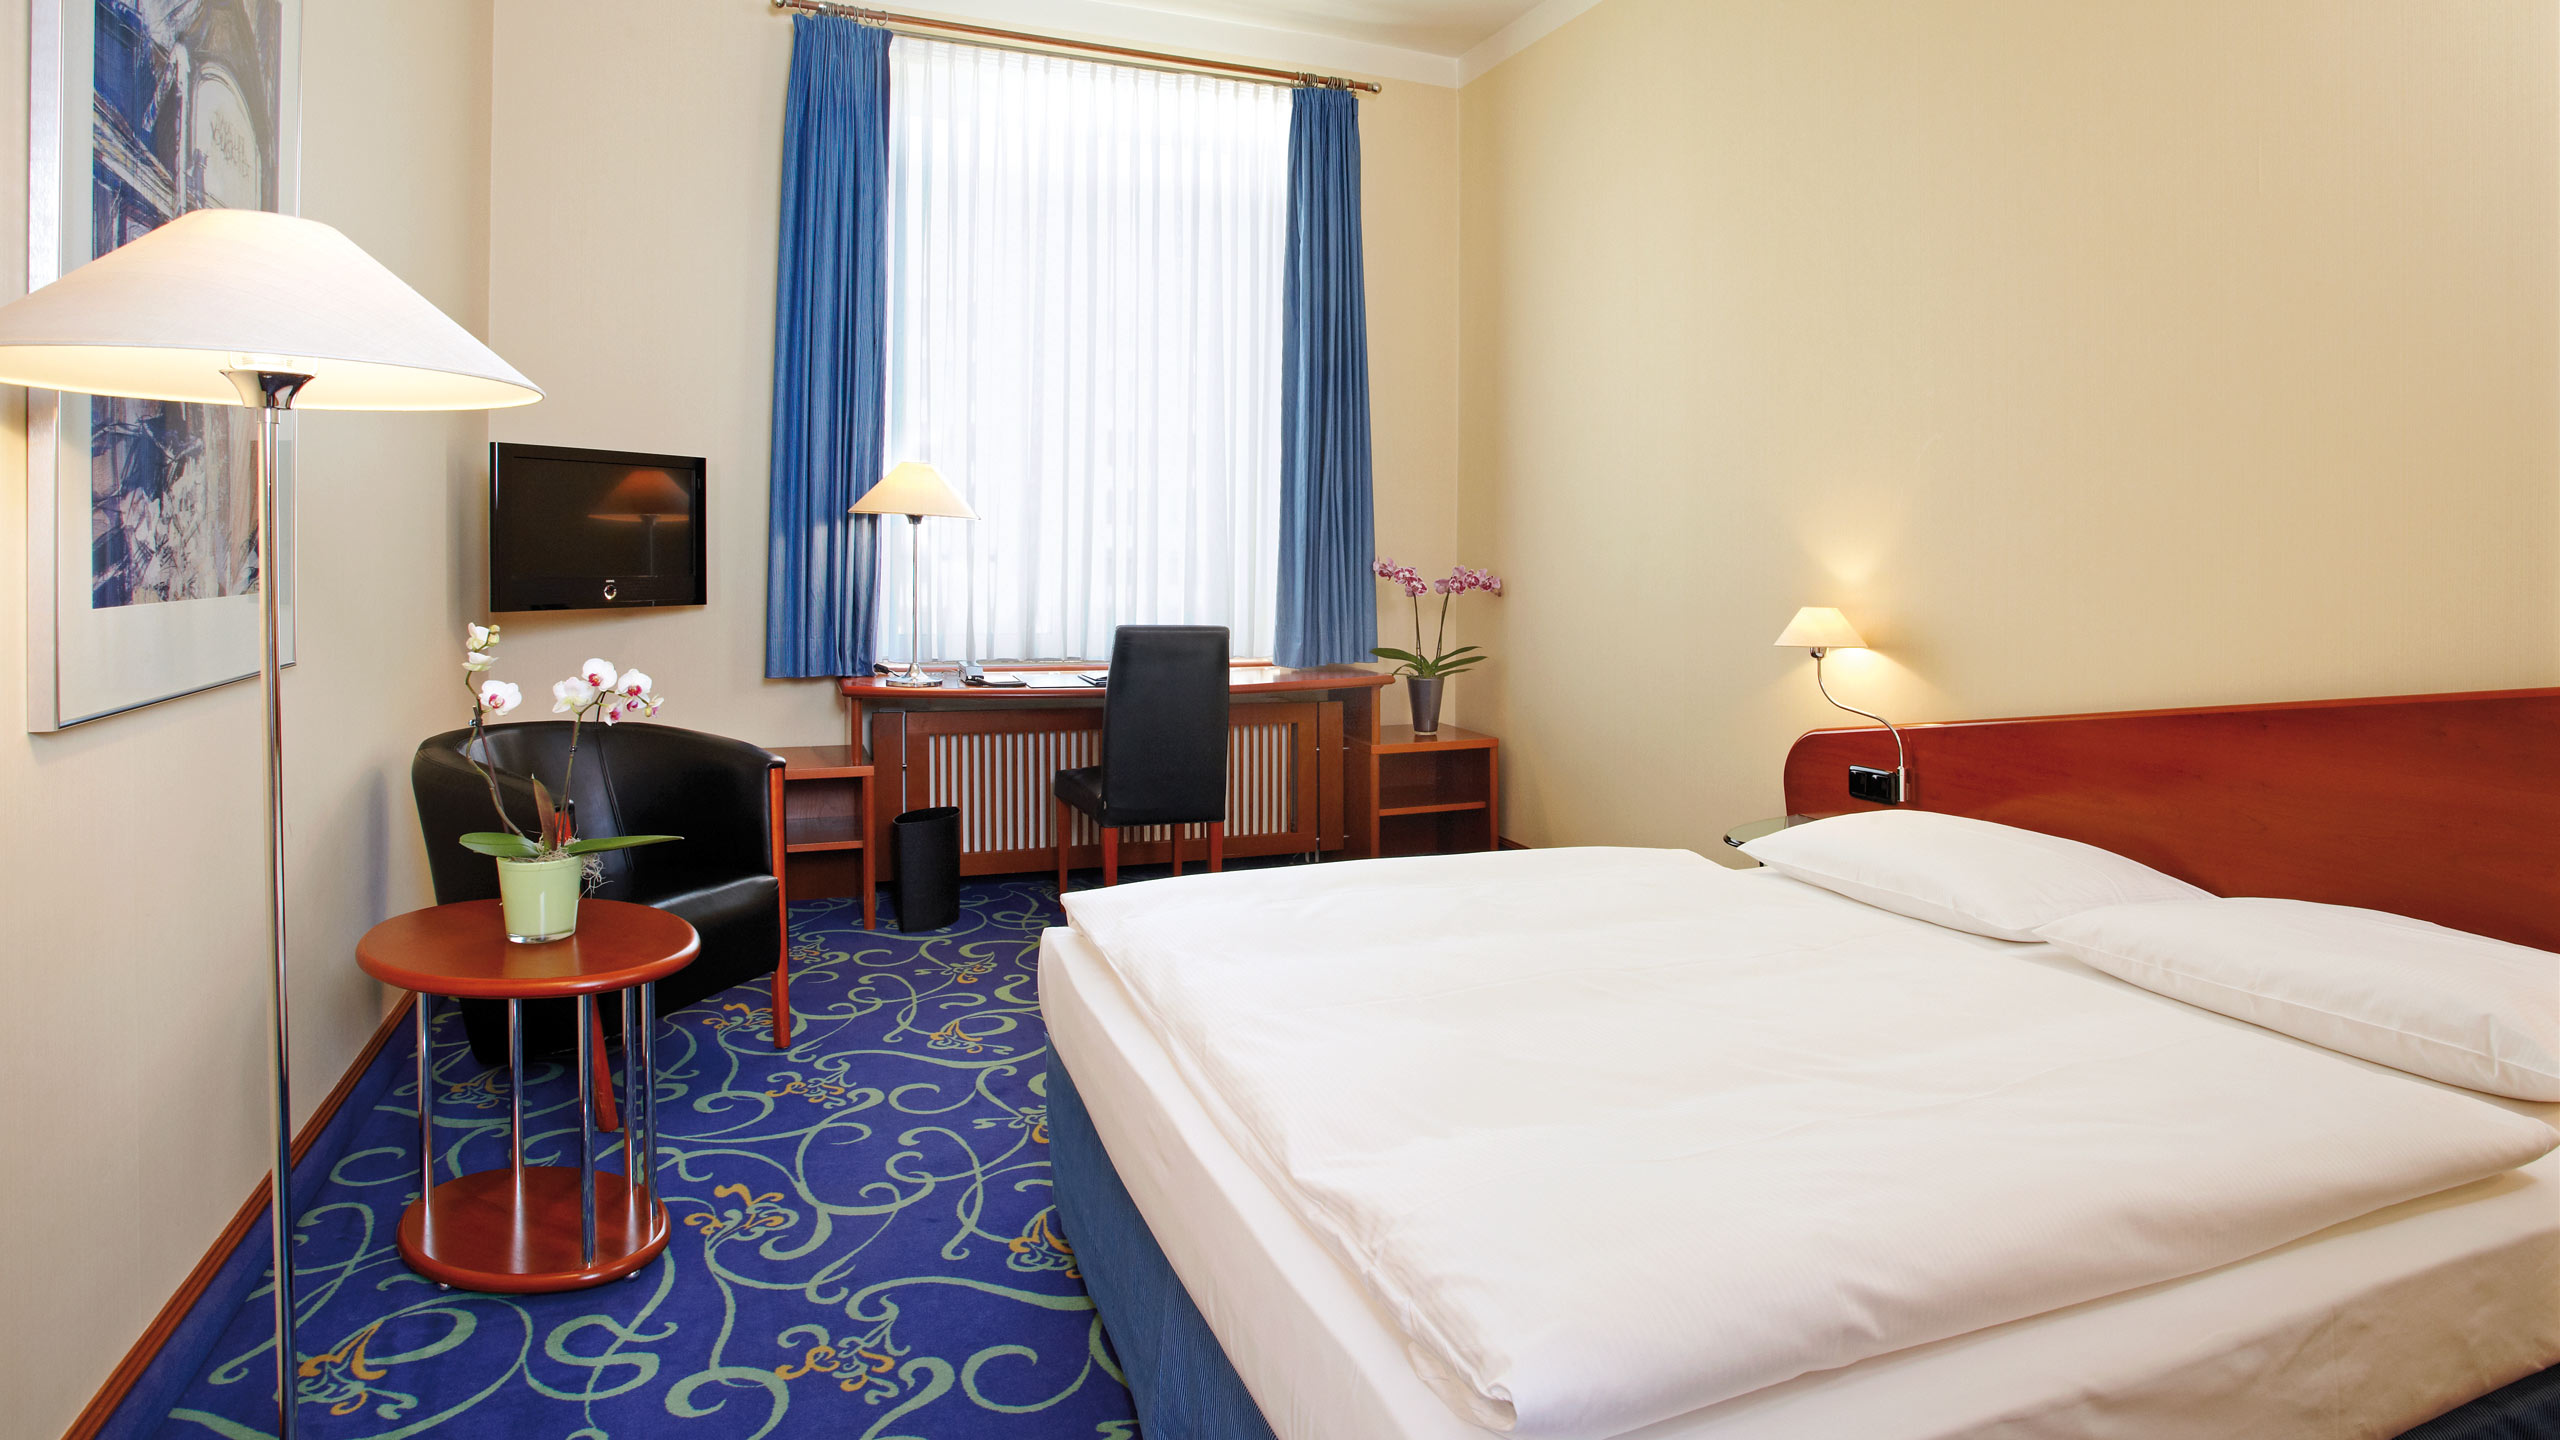 park hotel leipzig interessante angebote f r sie. Black Bedroom Furniture Sets. Home Design Ideas